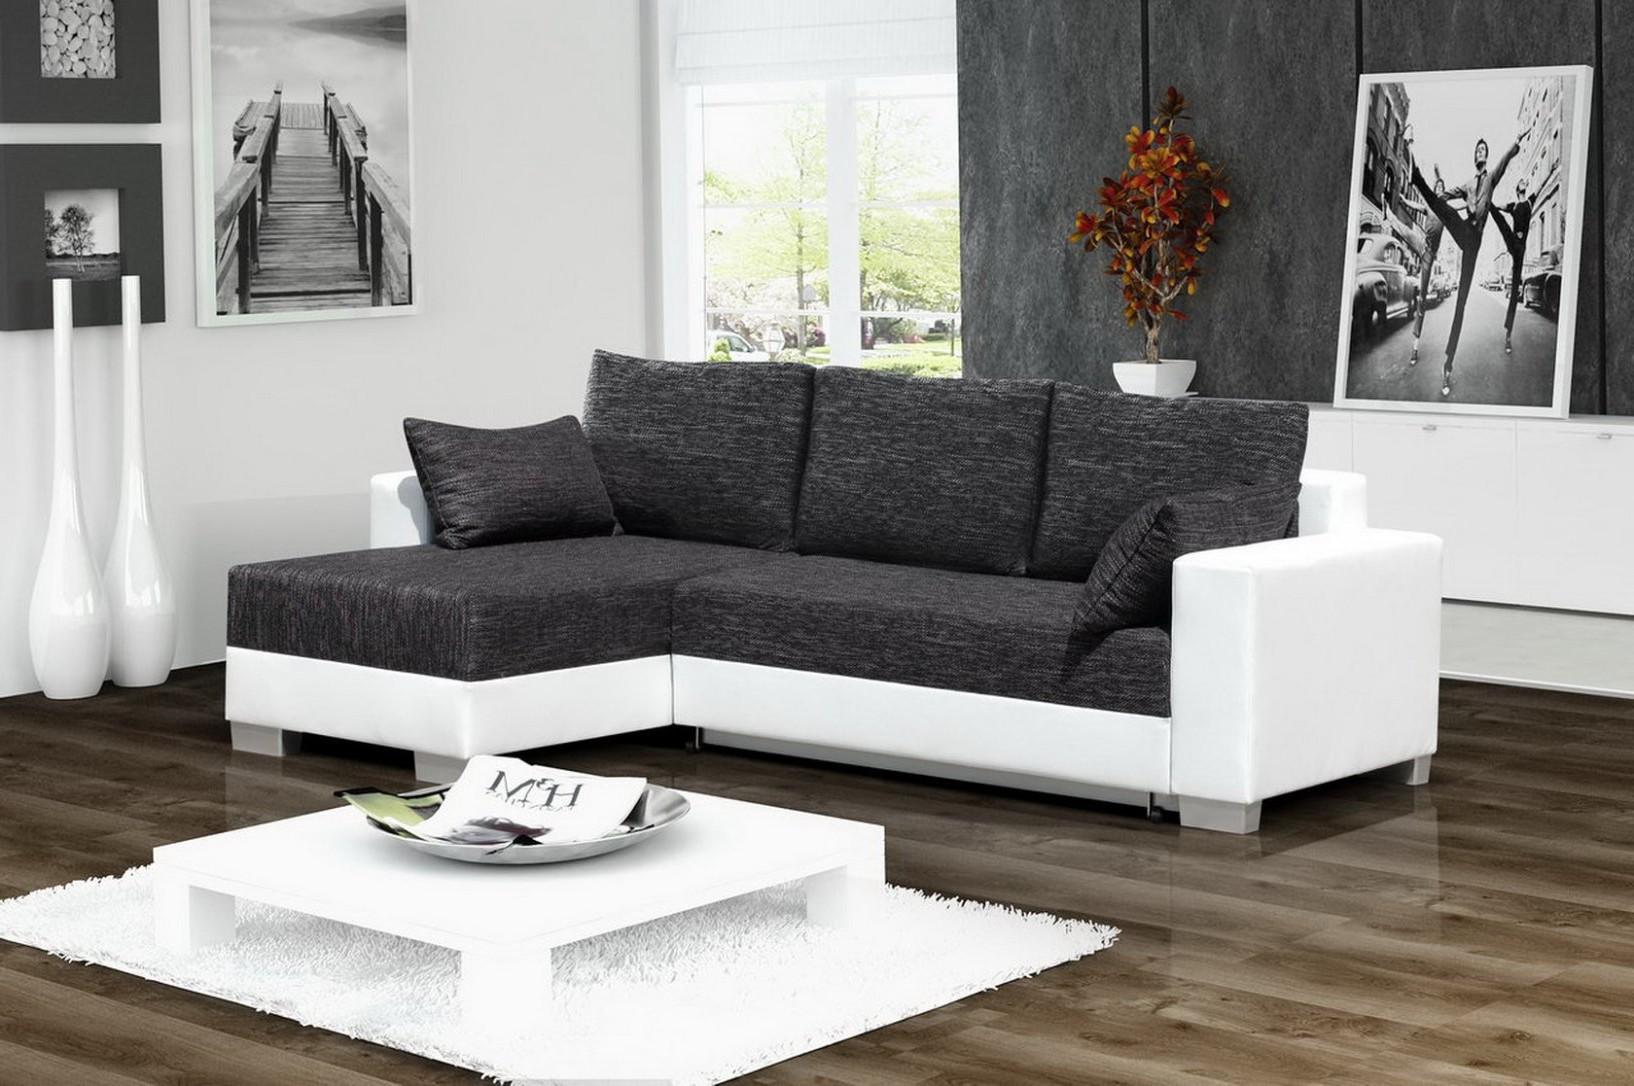 Canape Angle Convertible Blanc Et Gris